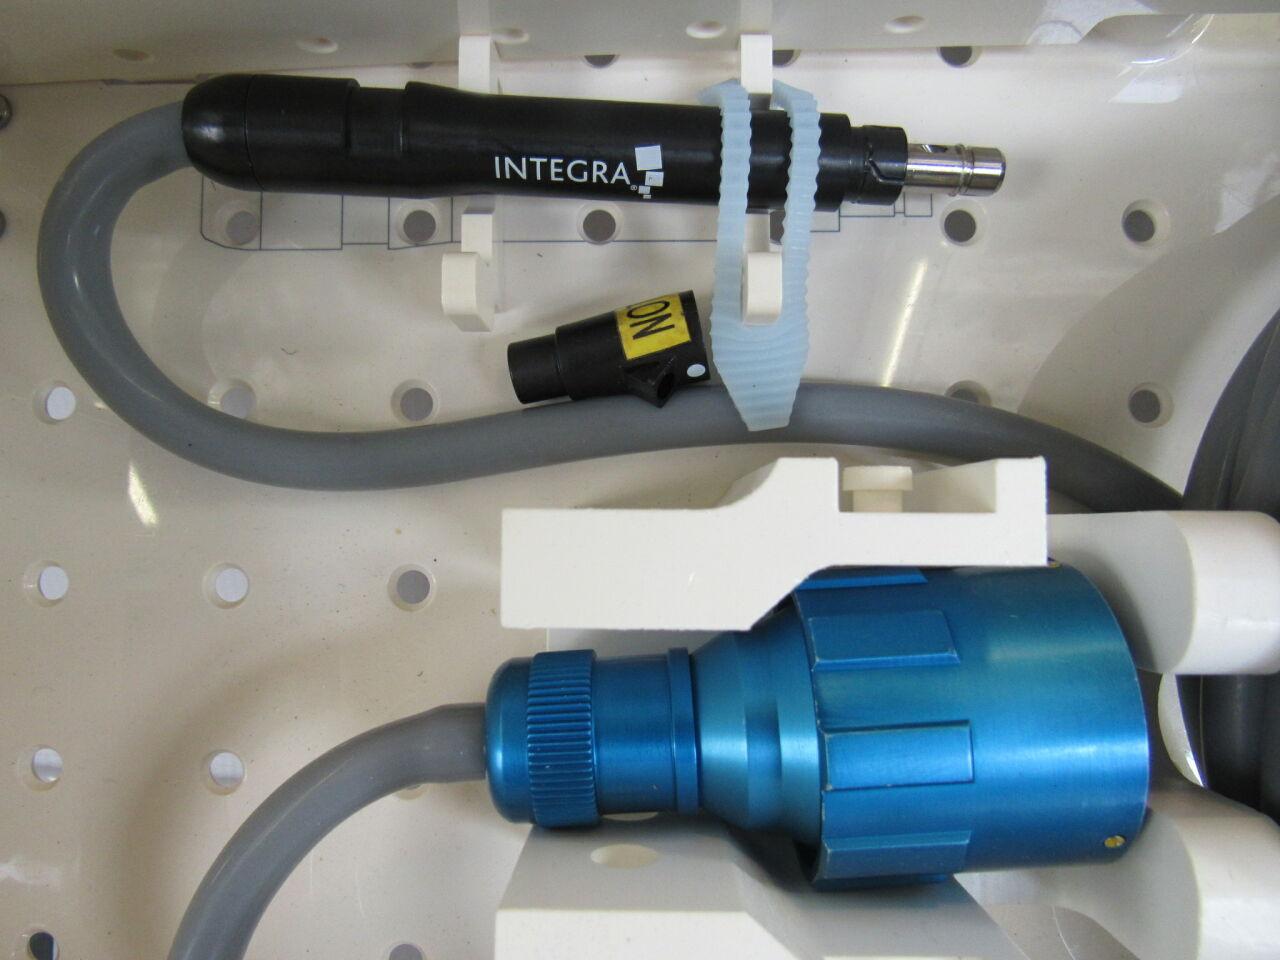 INTEGRA Cusa Excel 36 Ultrasonic Handpiece